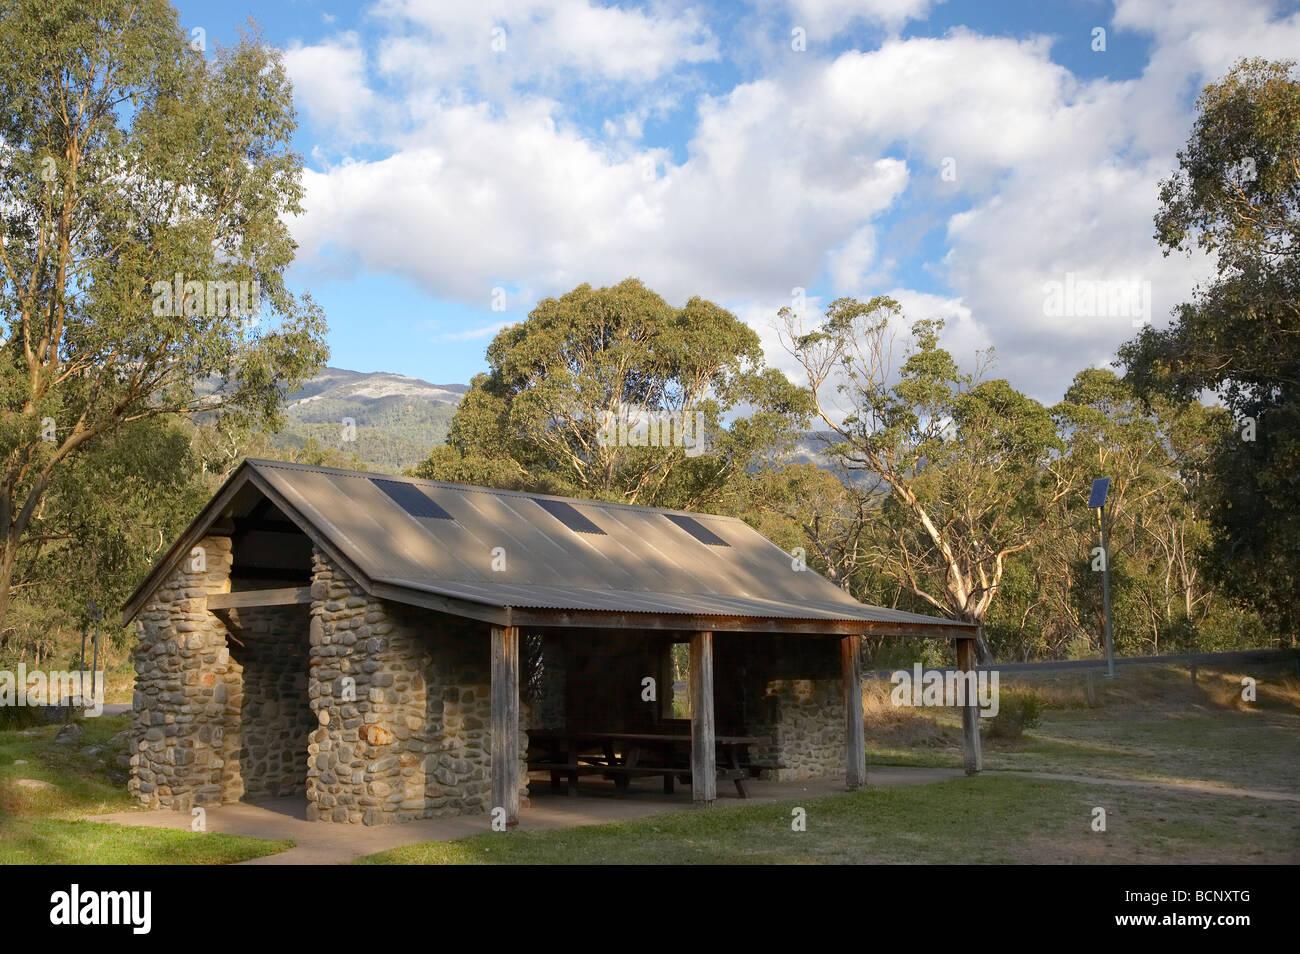 Picnic Shelter Geehi Flats Picnic Area Kosciuszko National Park Snowy Mountains New South Wales Australia - Stock Image